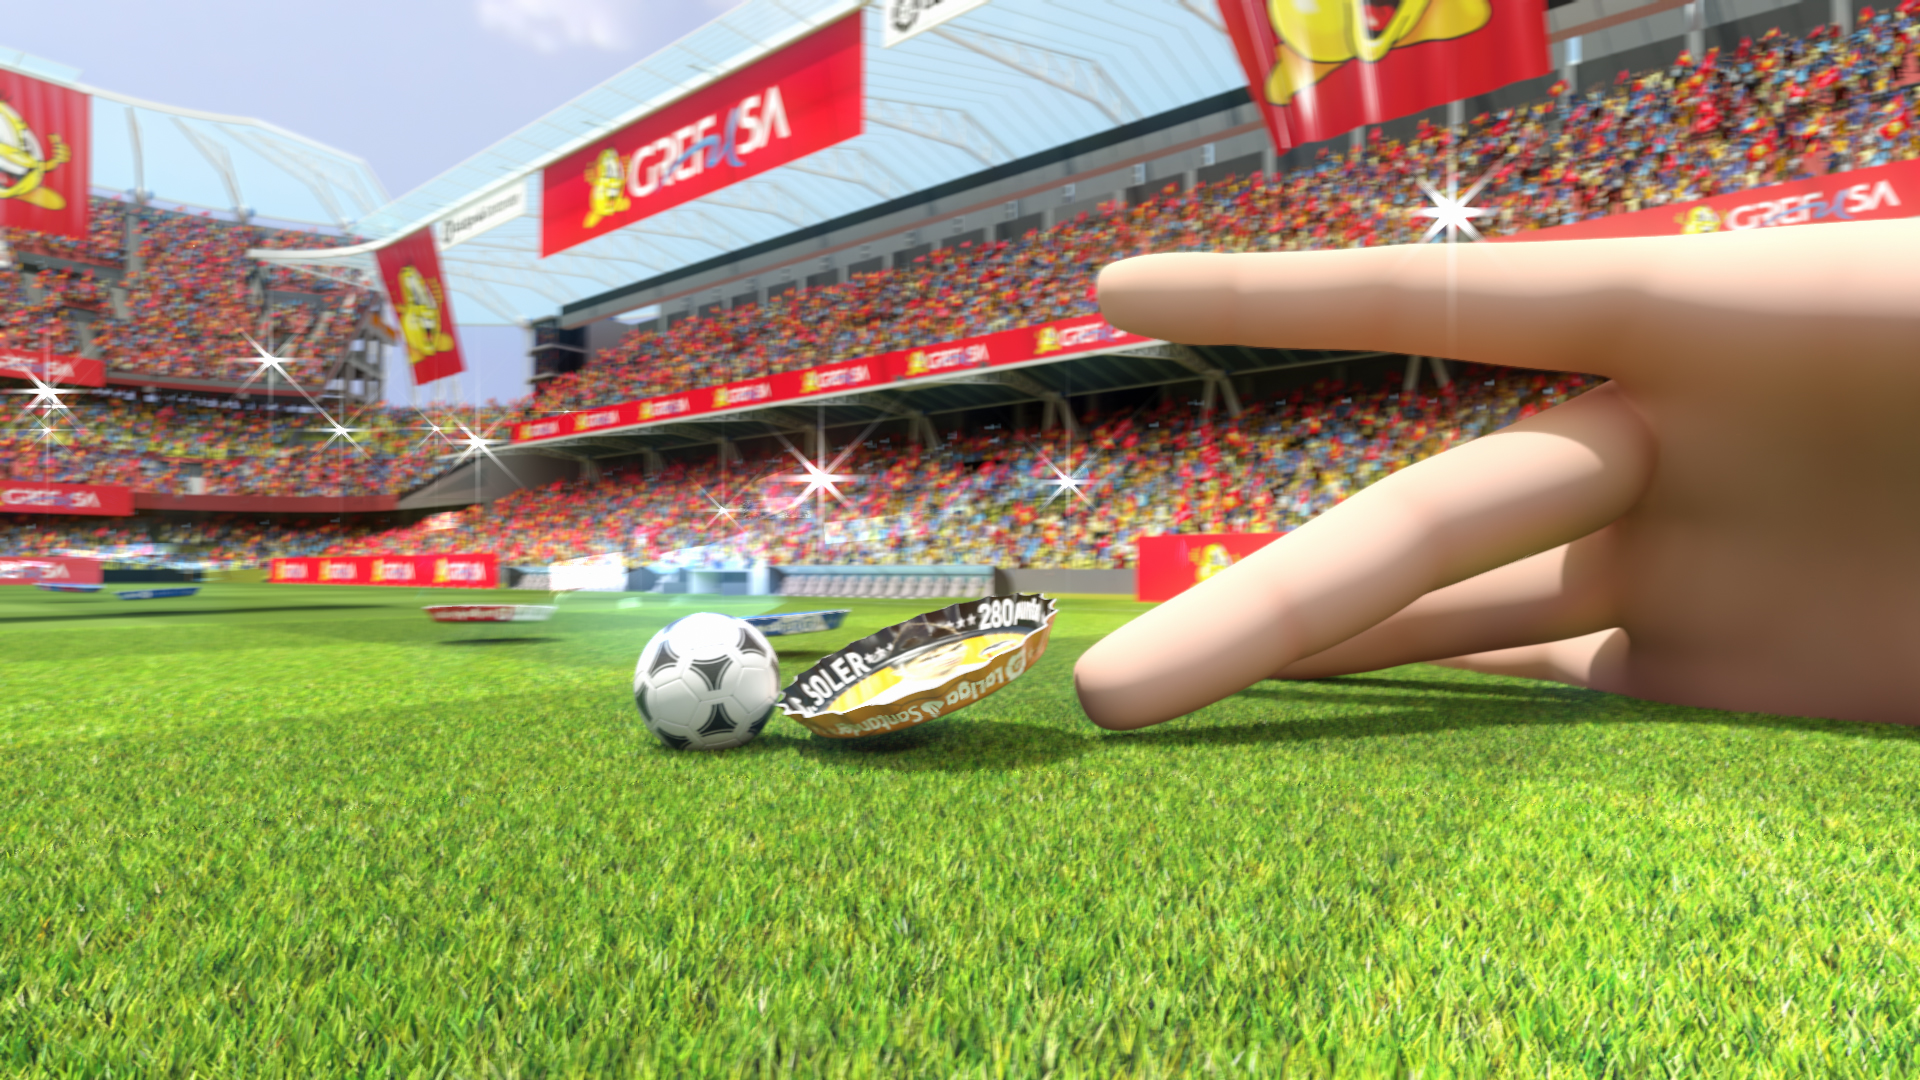 Virtual Art anuncio SPOT TV LA GRAFULIGA GREFUSA animación 3D valencia